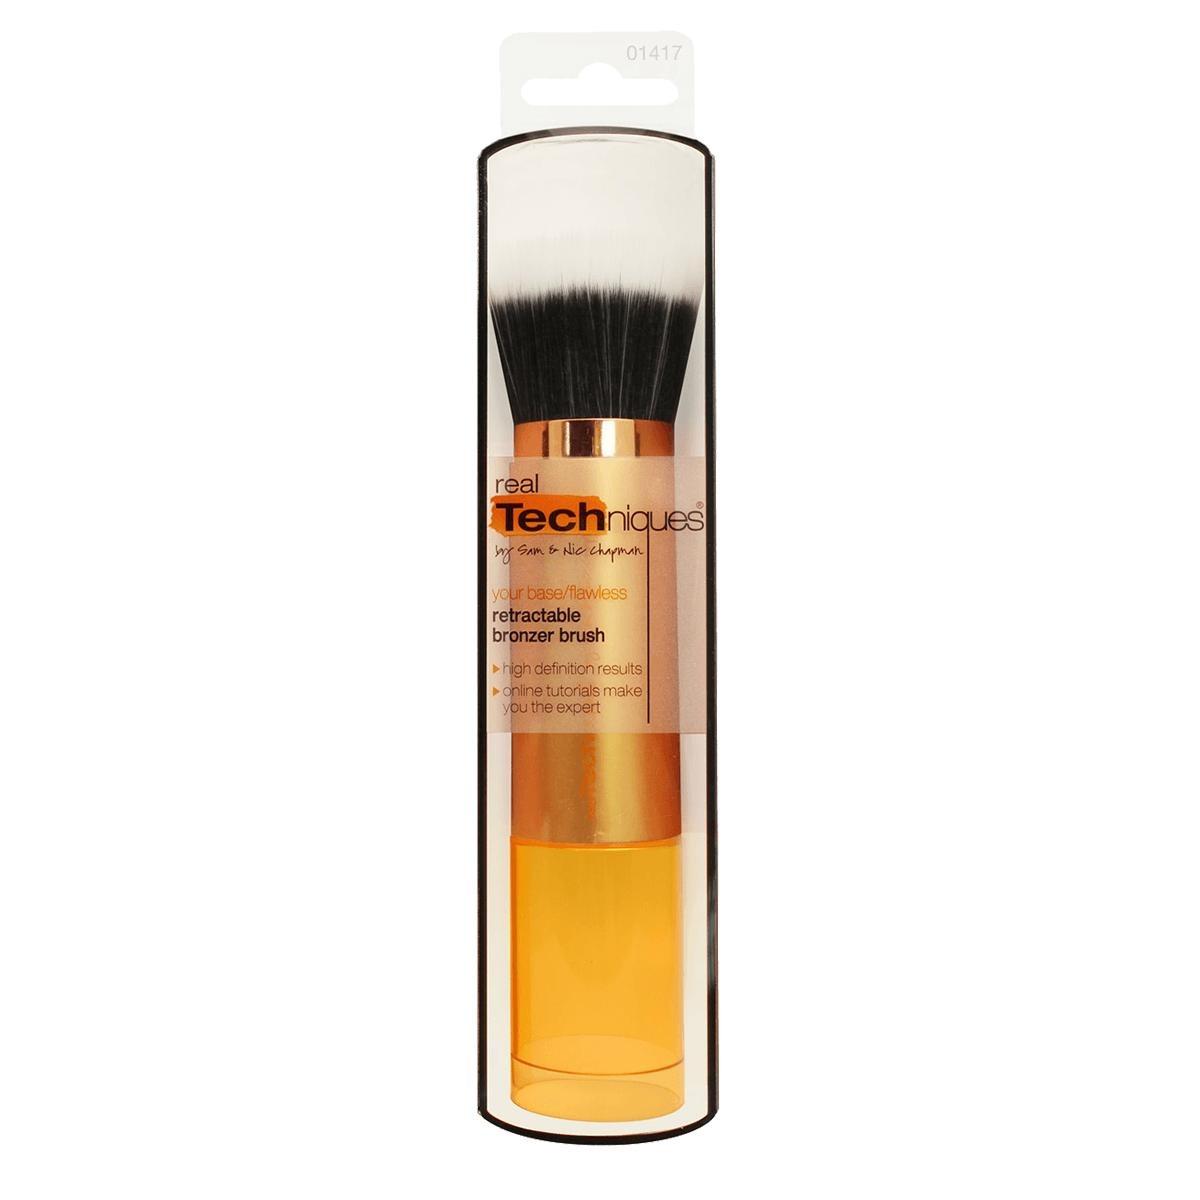 Real Techniques - 1417 Retractable Bronzer Brush